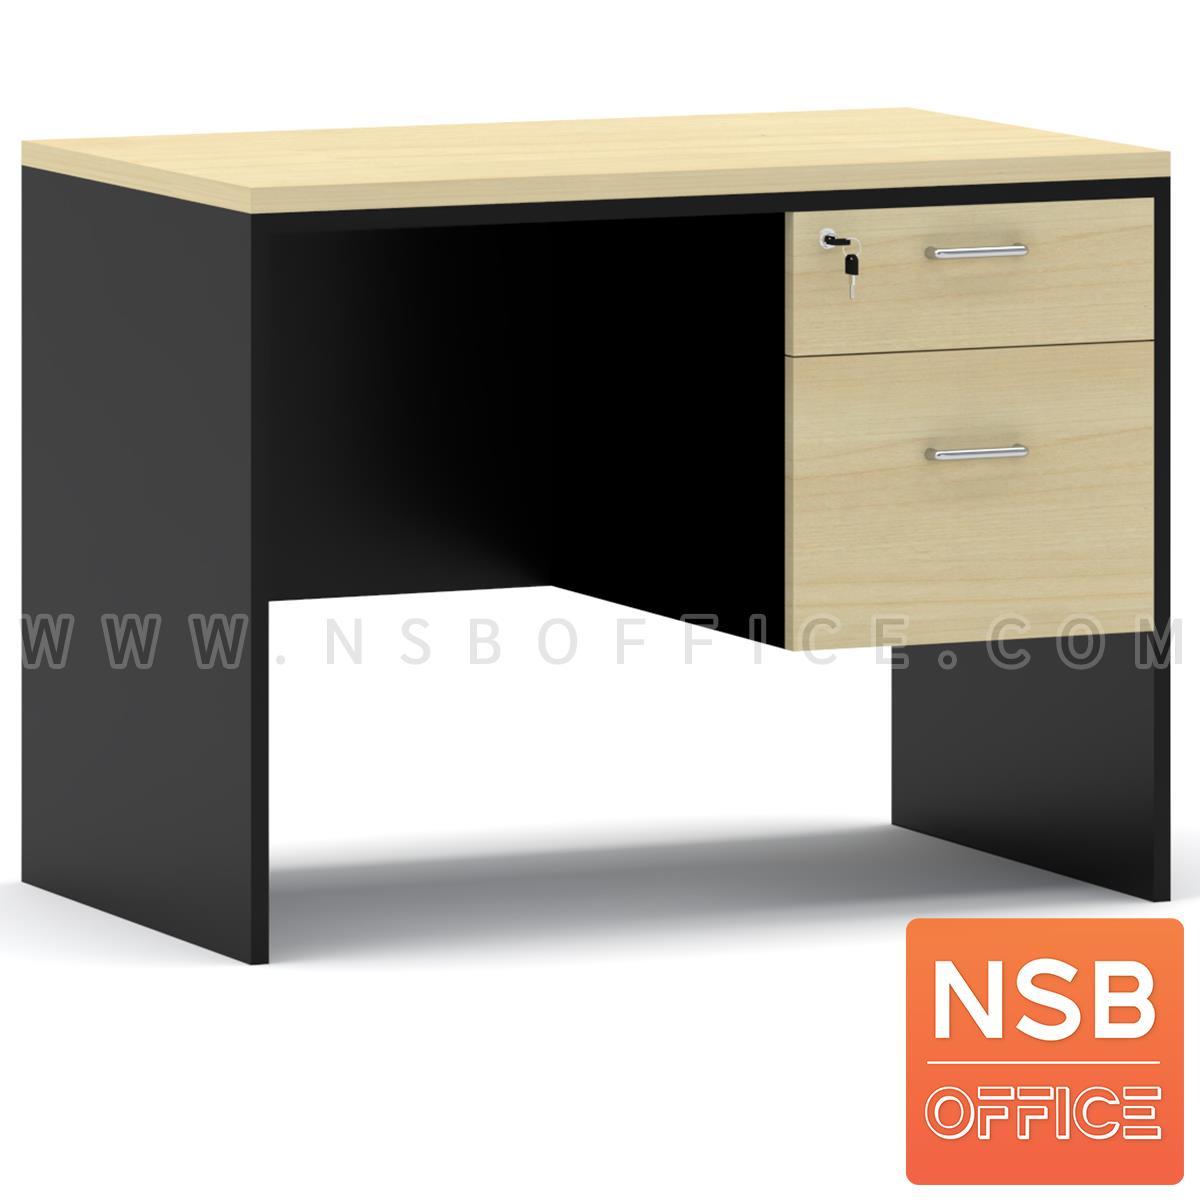 A01A026:โต๊ะทำงานไม้ PVC 2 ลิ้นชัก รุ่น Pinery (ไพน์เนอรี่) ขนาด 100W*60D cm.